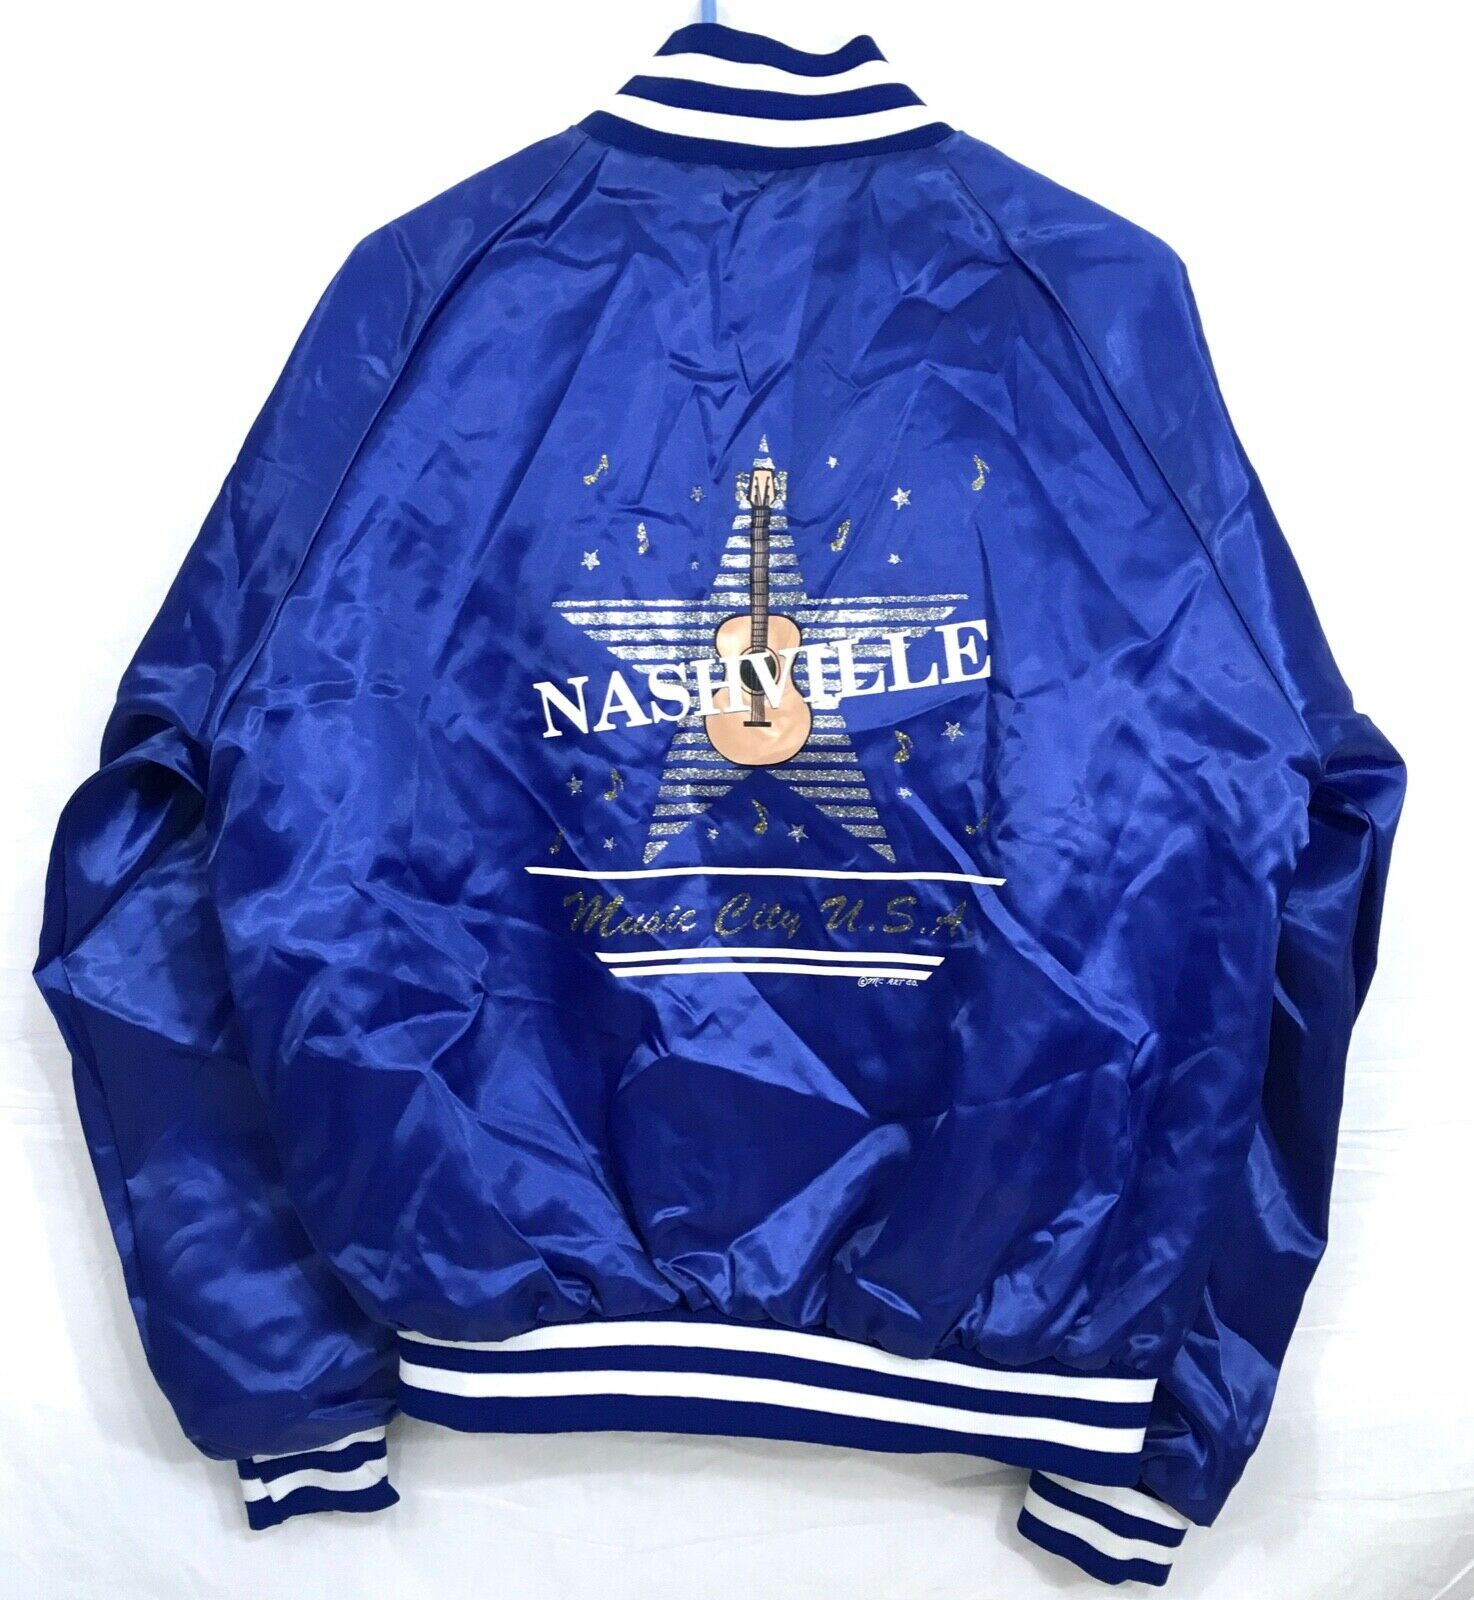 Vintage 1980s NASHVILLE MUSIC Nylon Blau jacke (Größe L) Made in USA  A33